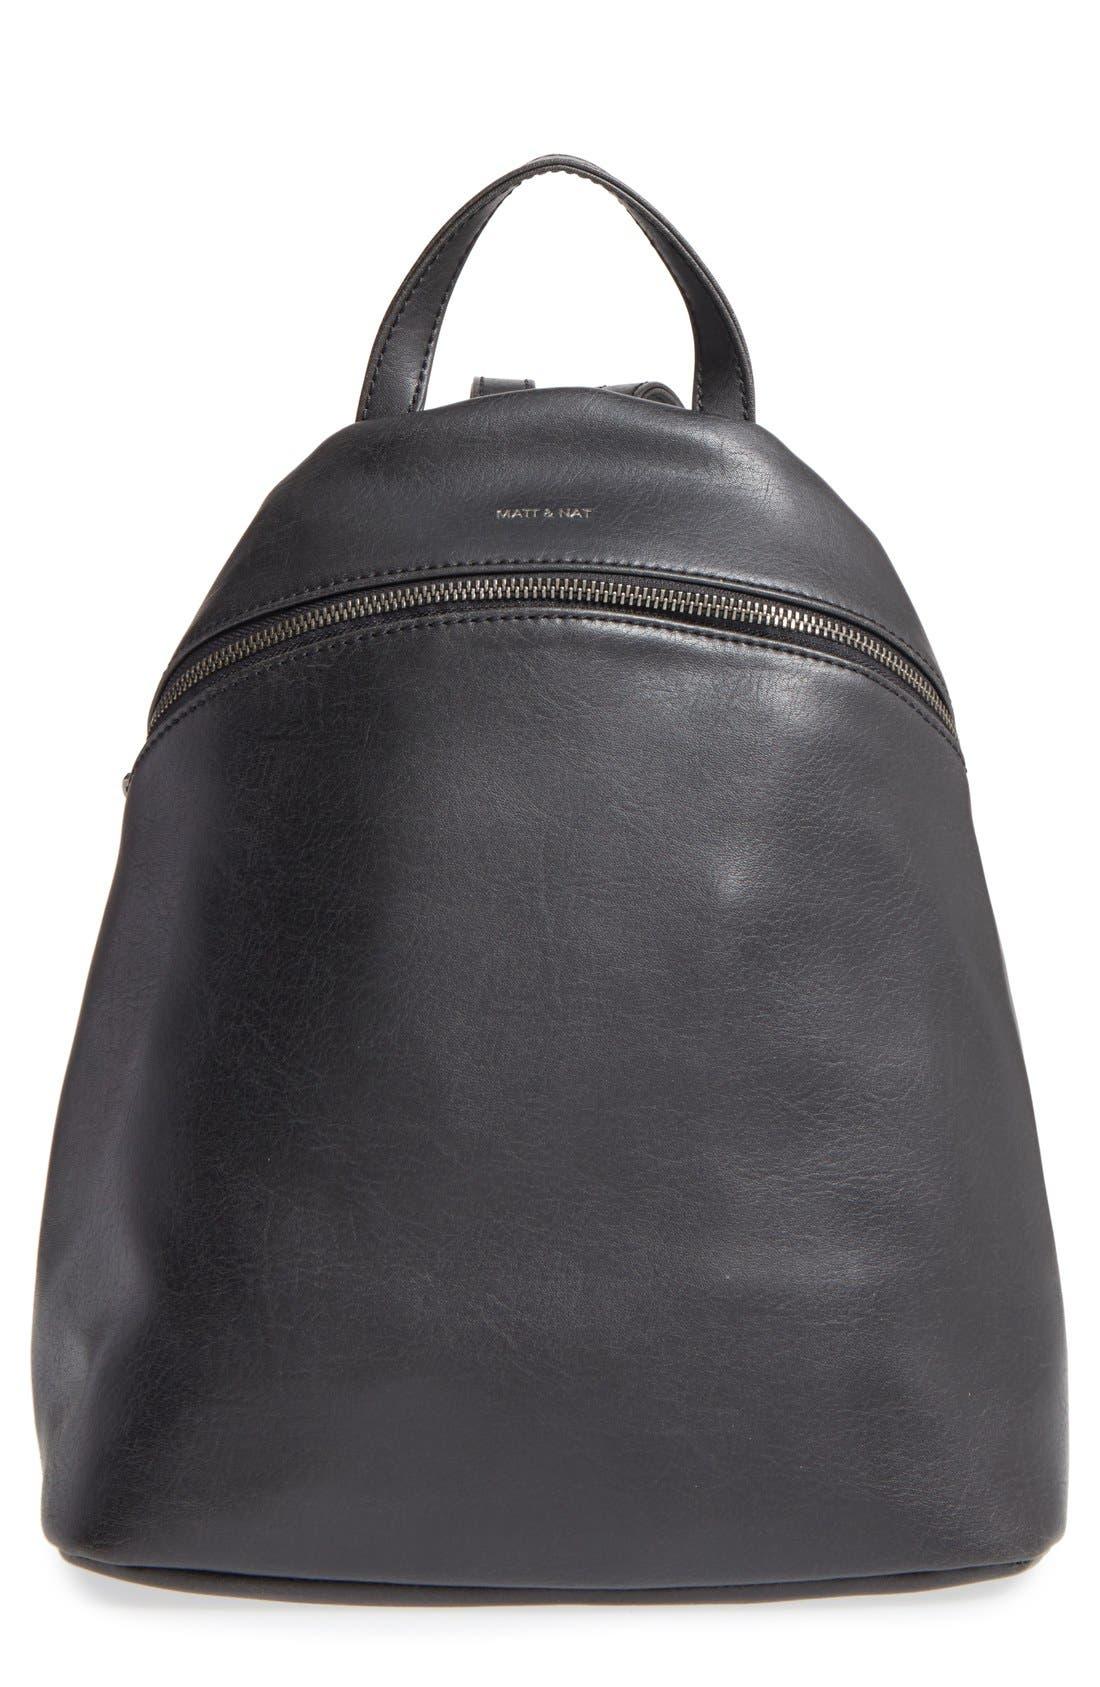 Alternate Image 1 Selected - Matt & Nat 'Aries' Faux Leather Backpack